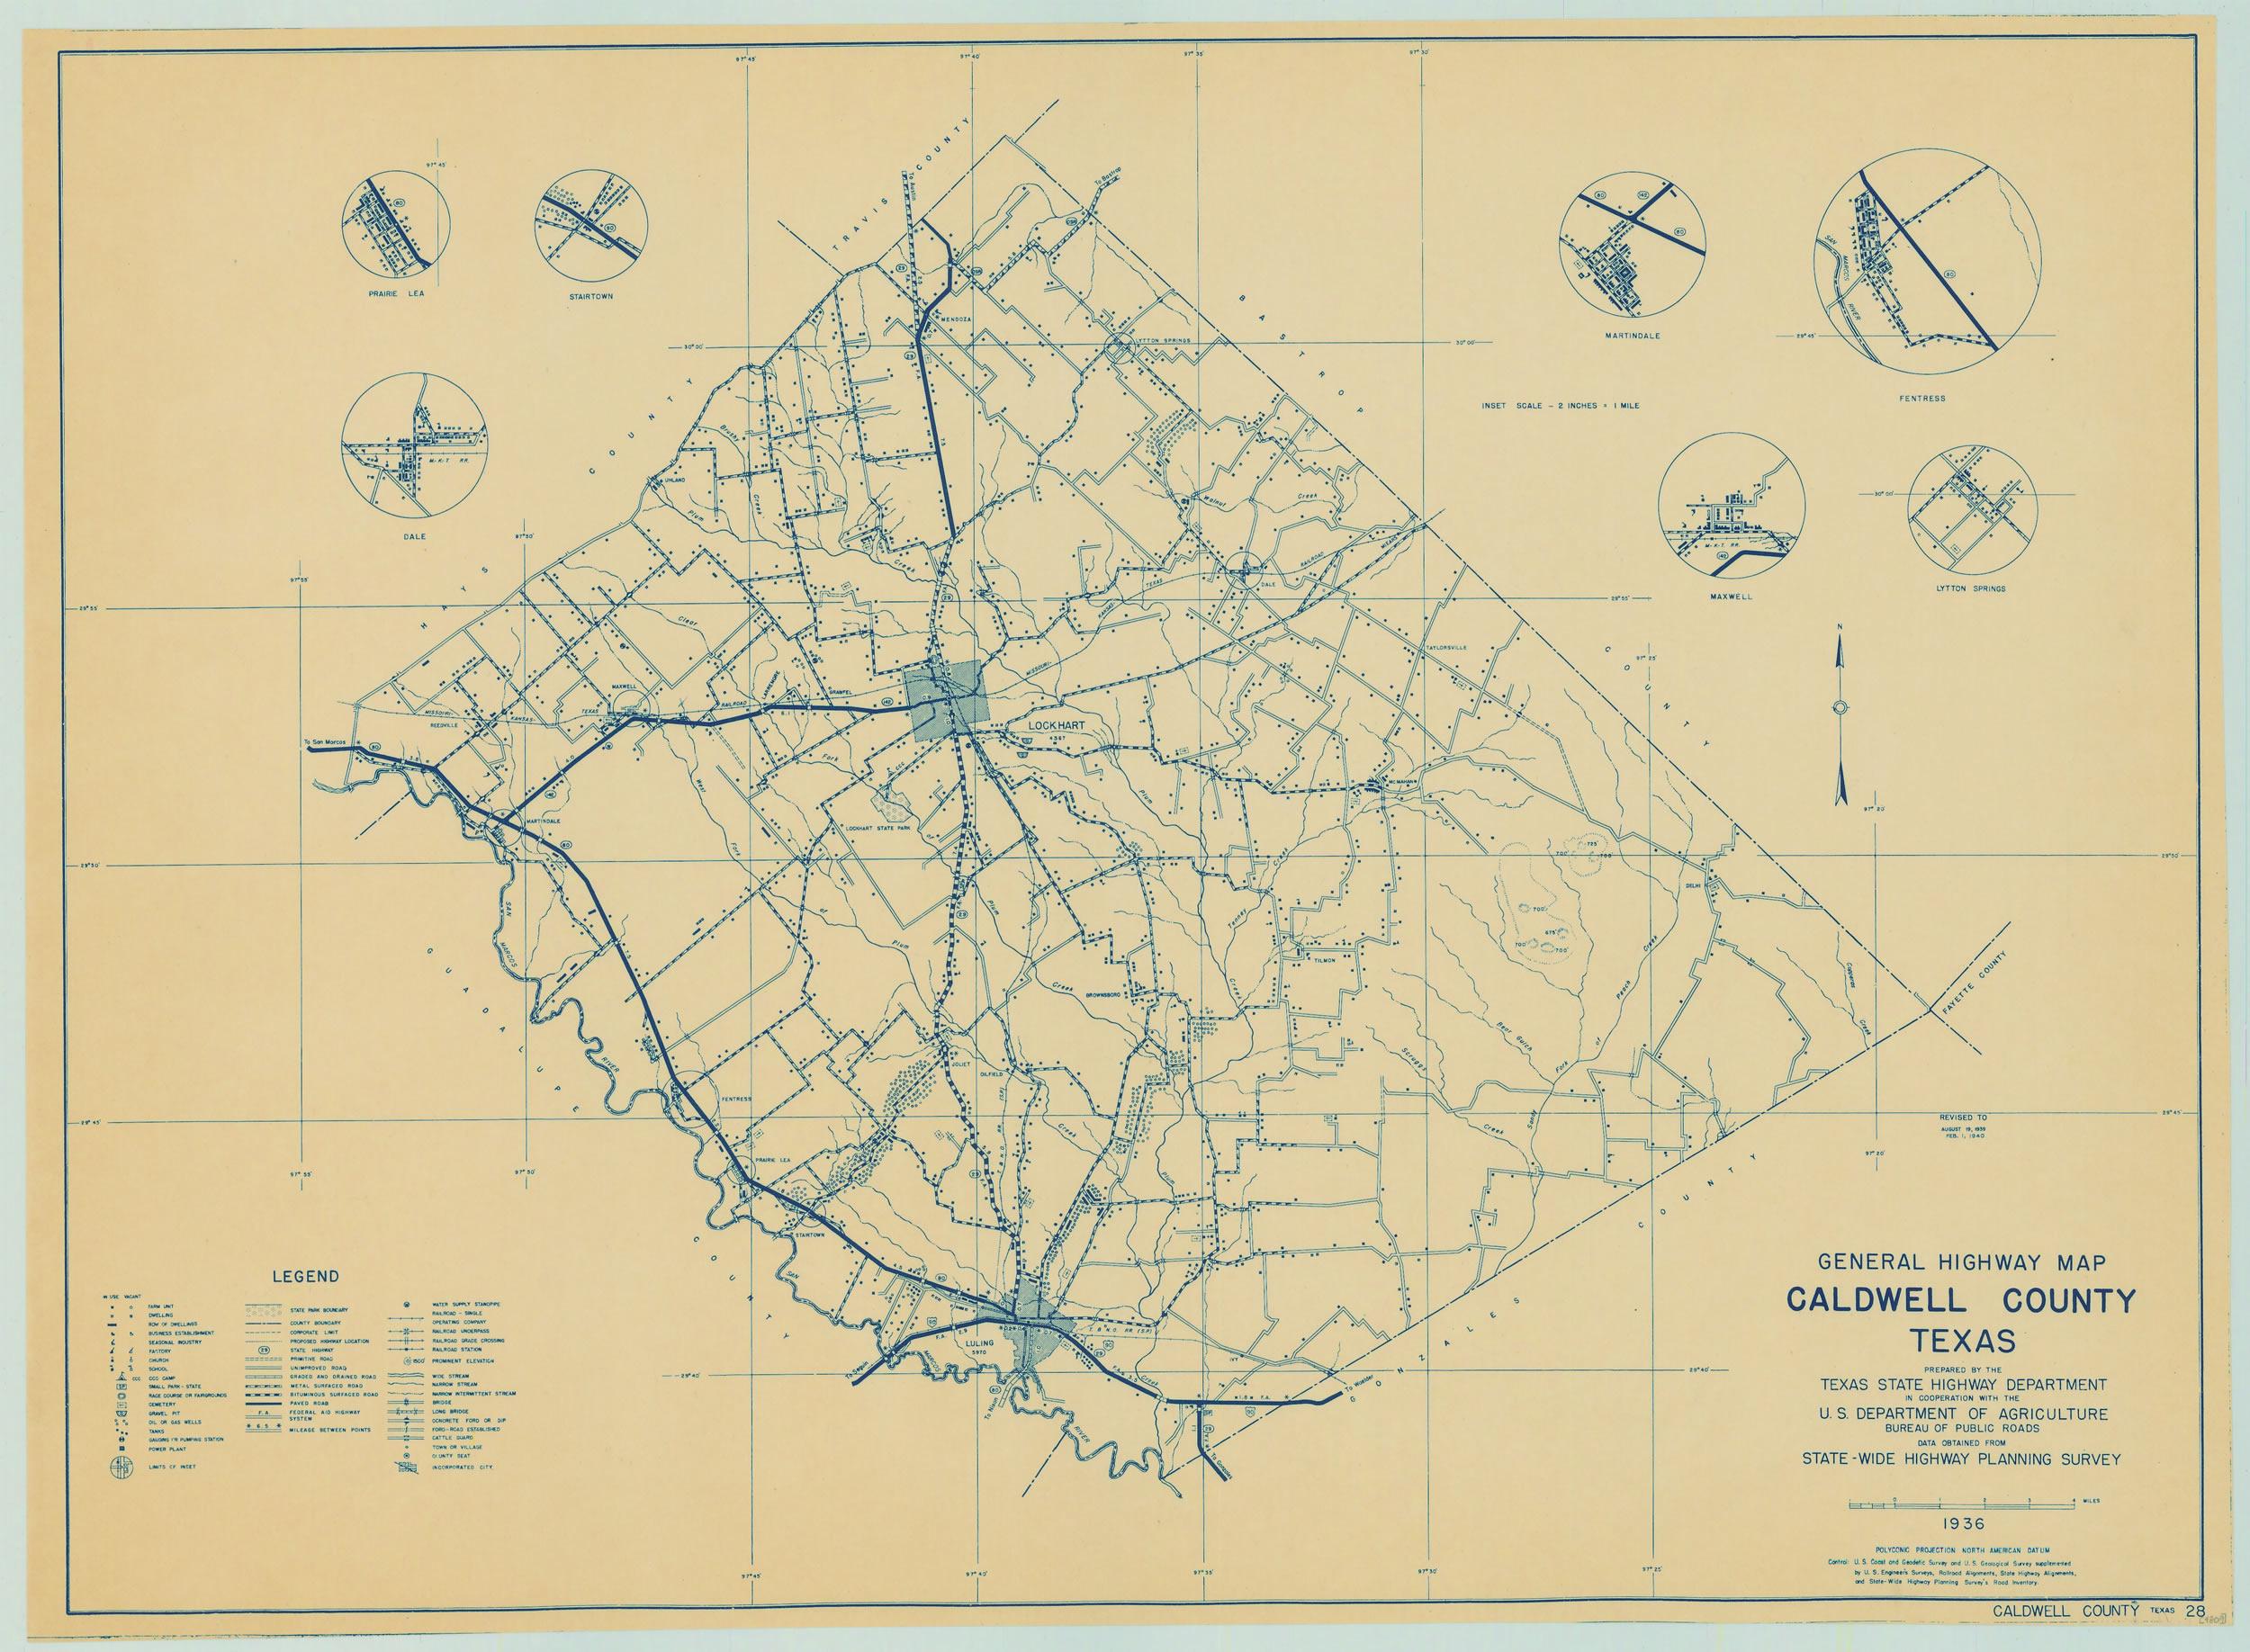 Texasfreeway > Statewide - Caldwell Texas Map